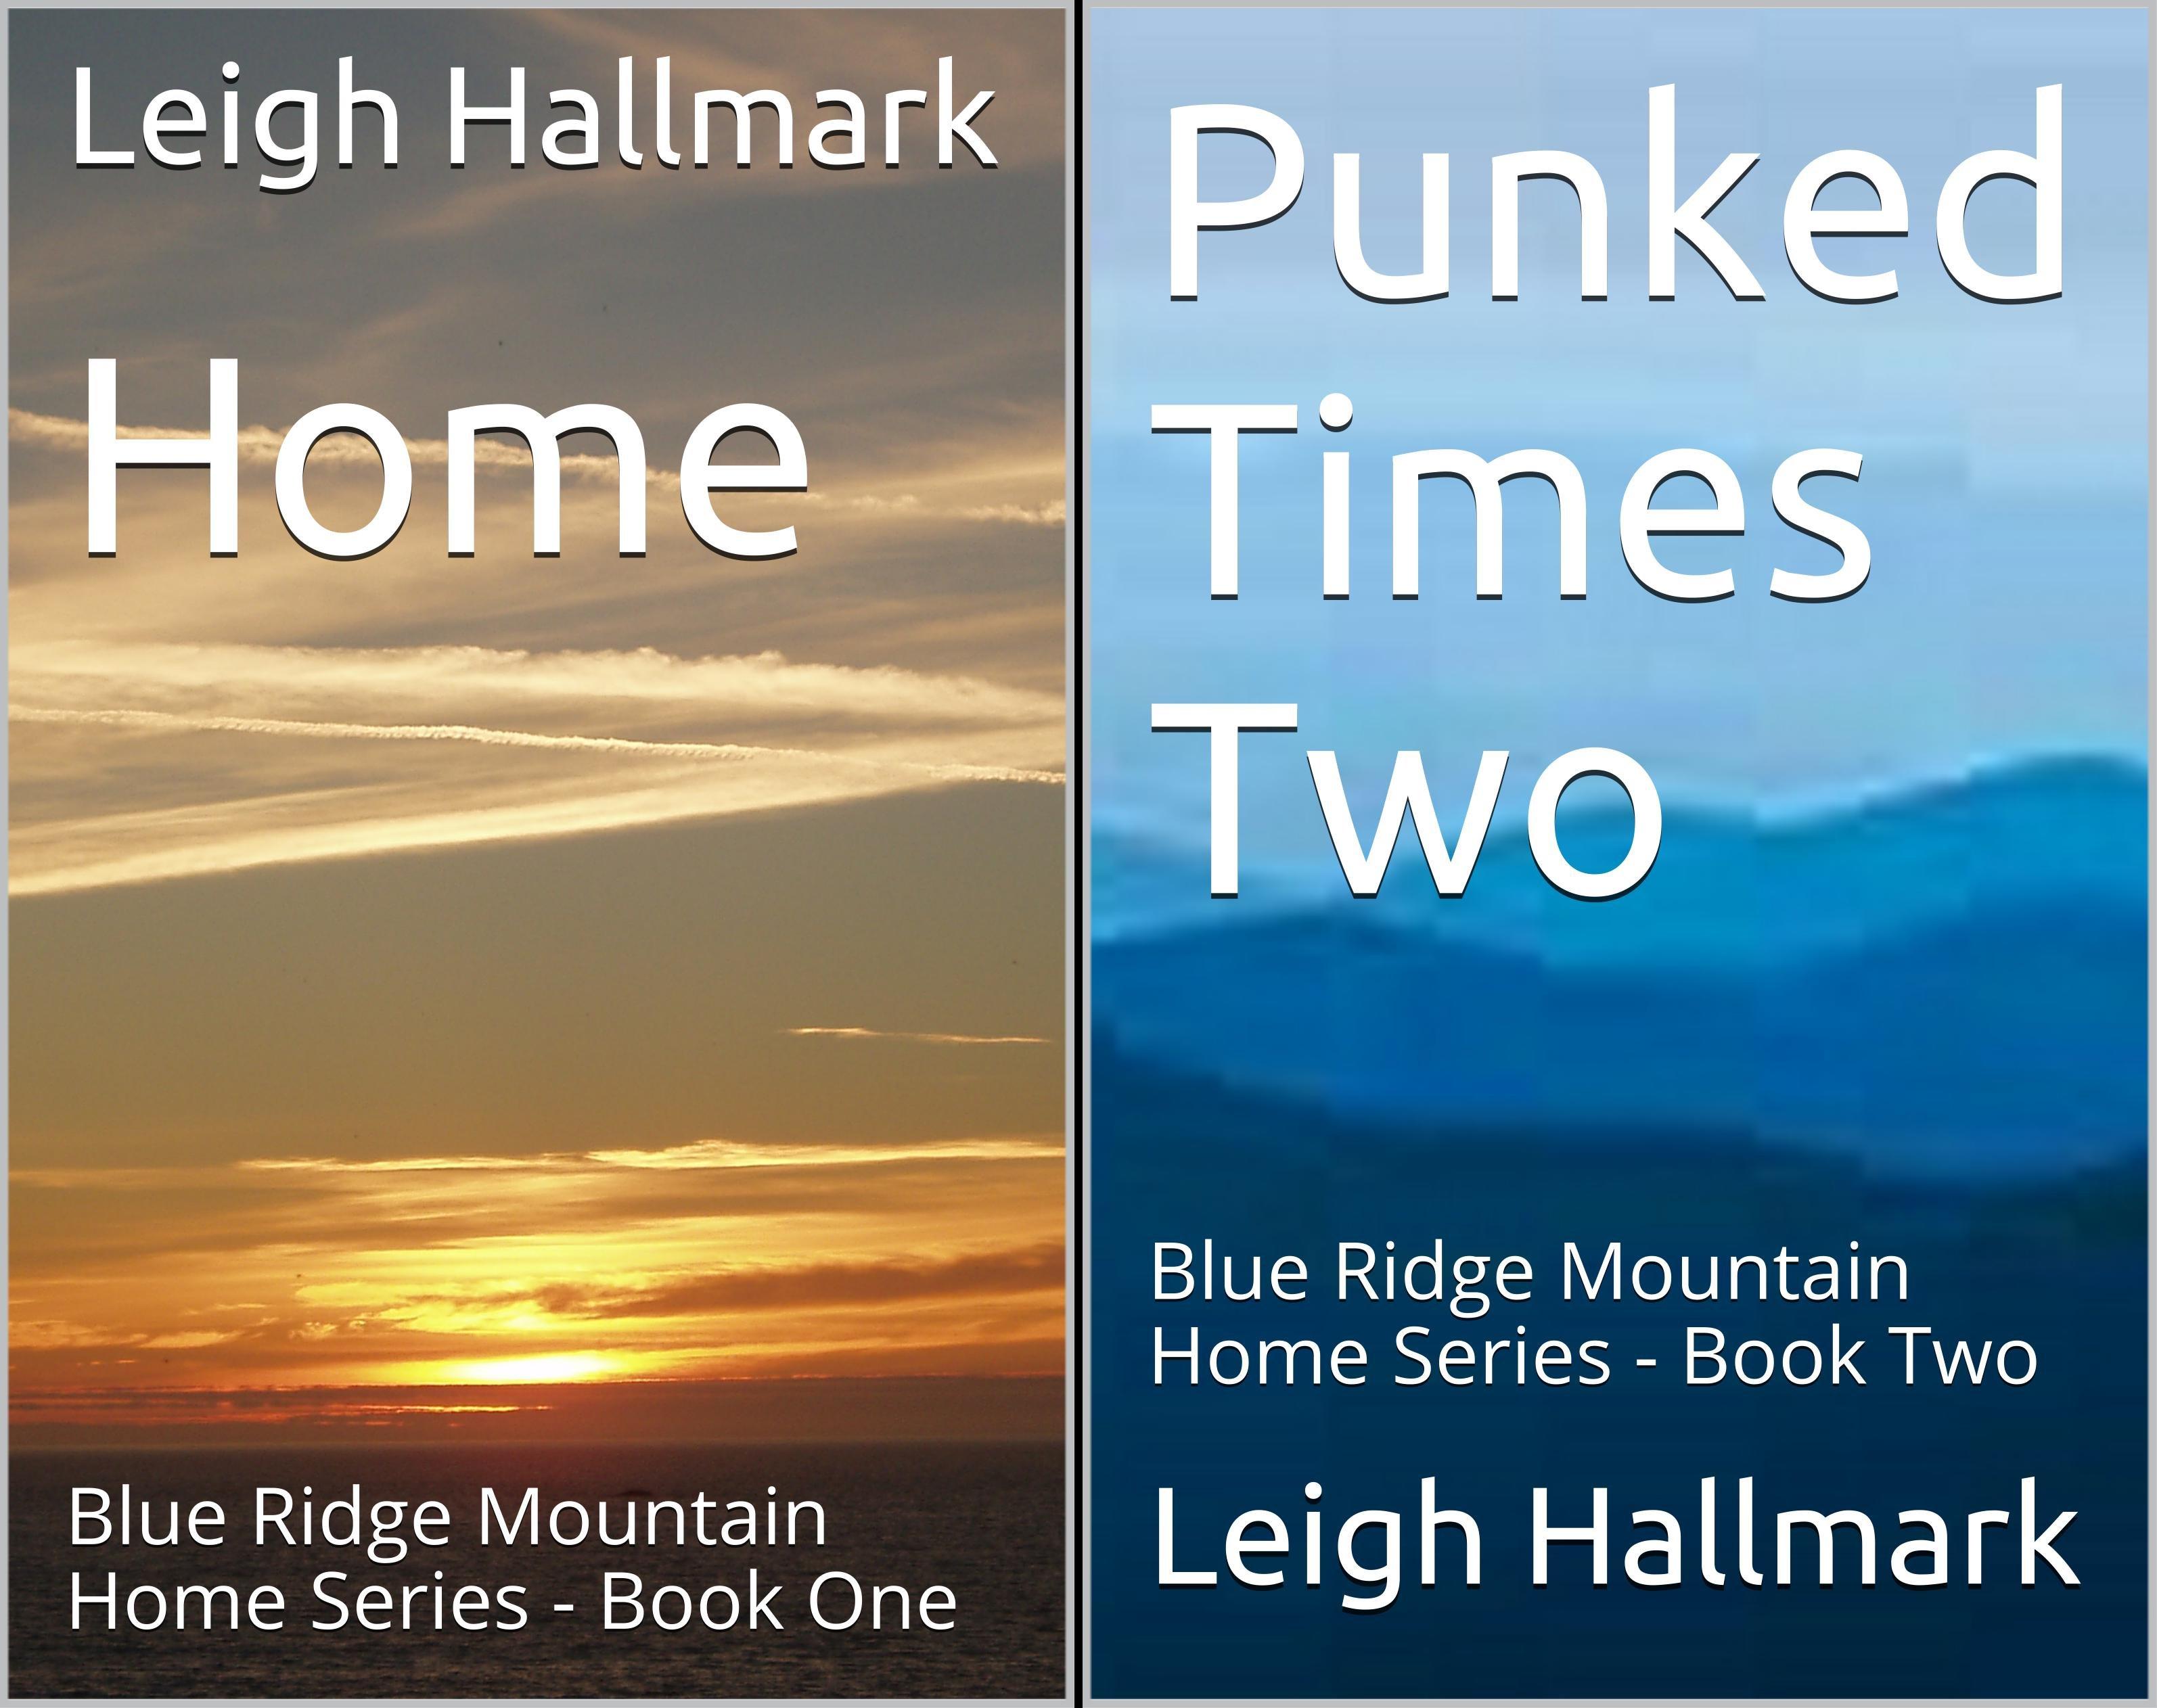 Blue Ridge Mountain Home Series (2 Book Series)